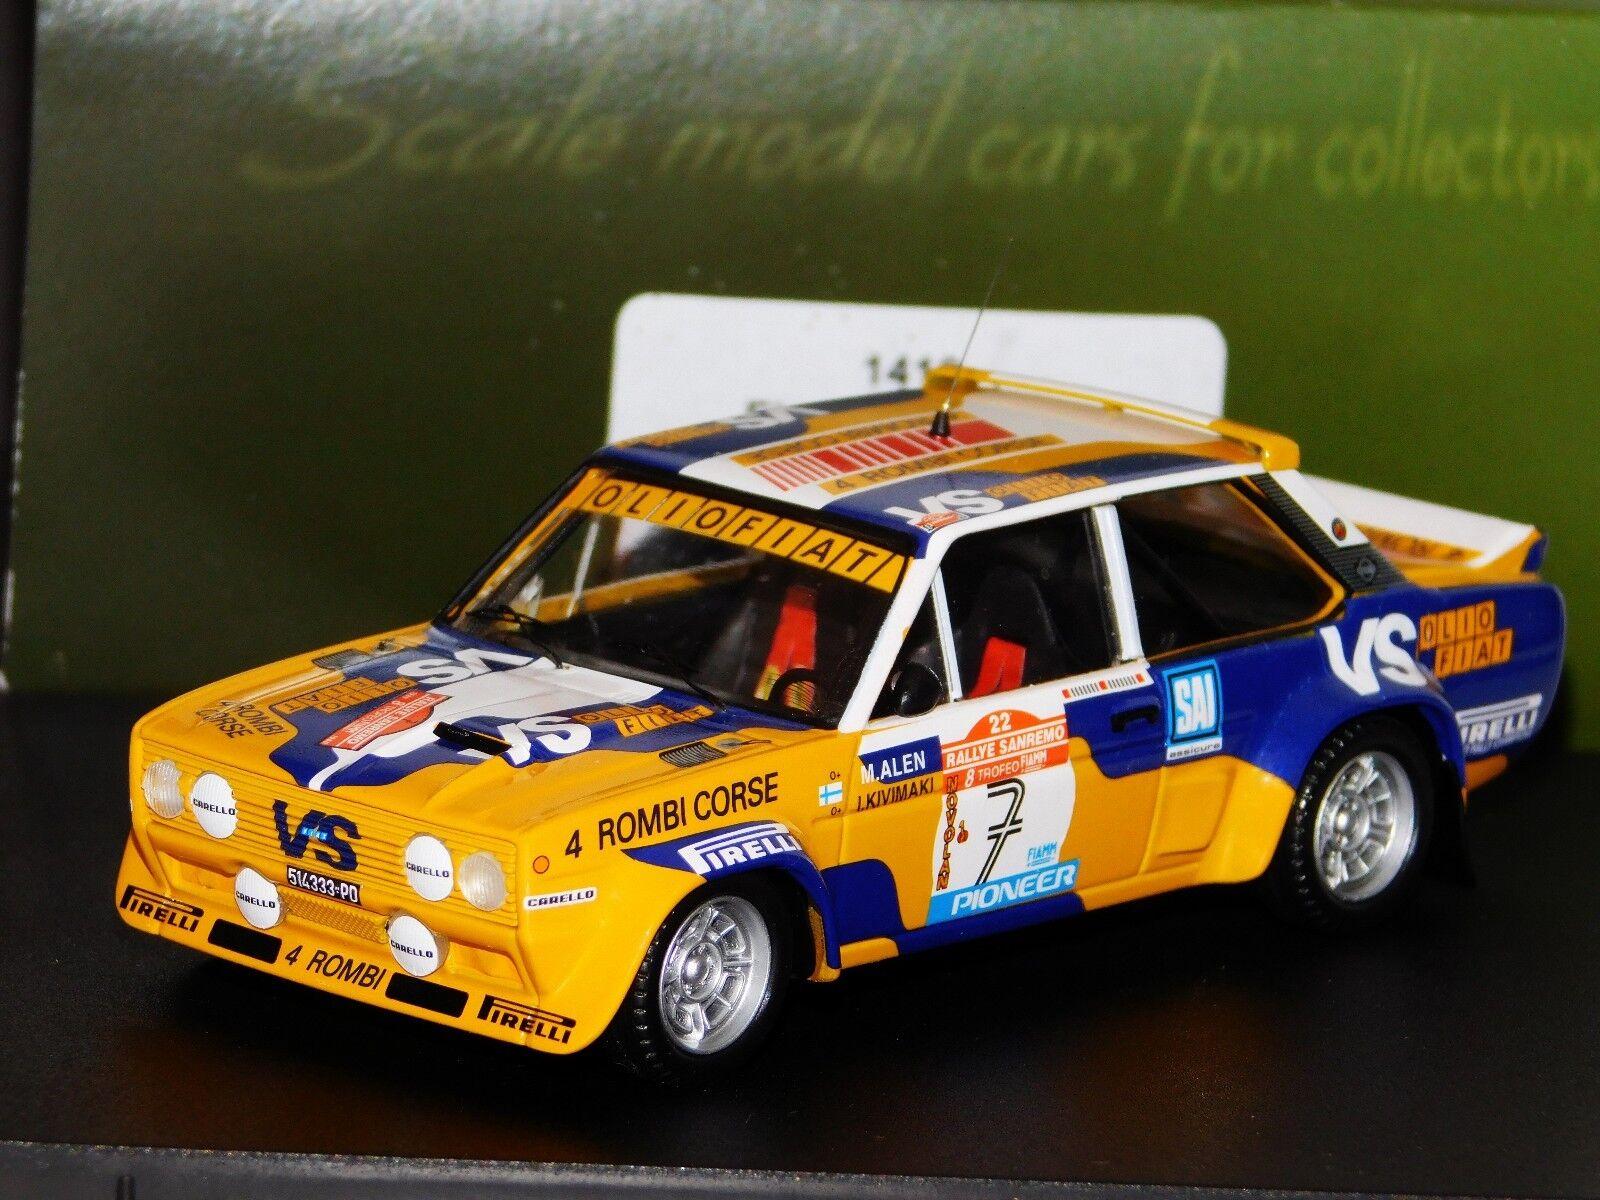 Fiat 131 Abarth 4 Antivandalismo Corse M. Alen Sanremo 1980 Trofeu 1416 1 43